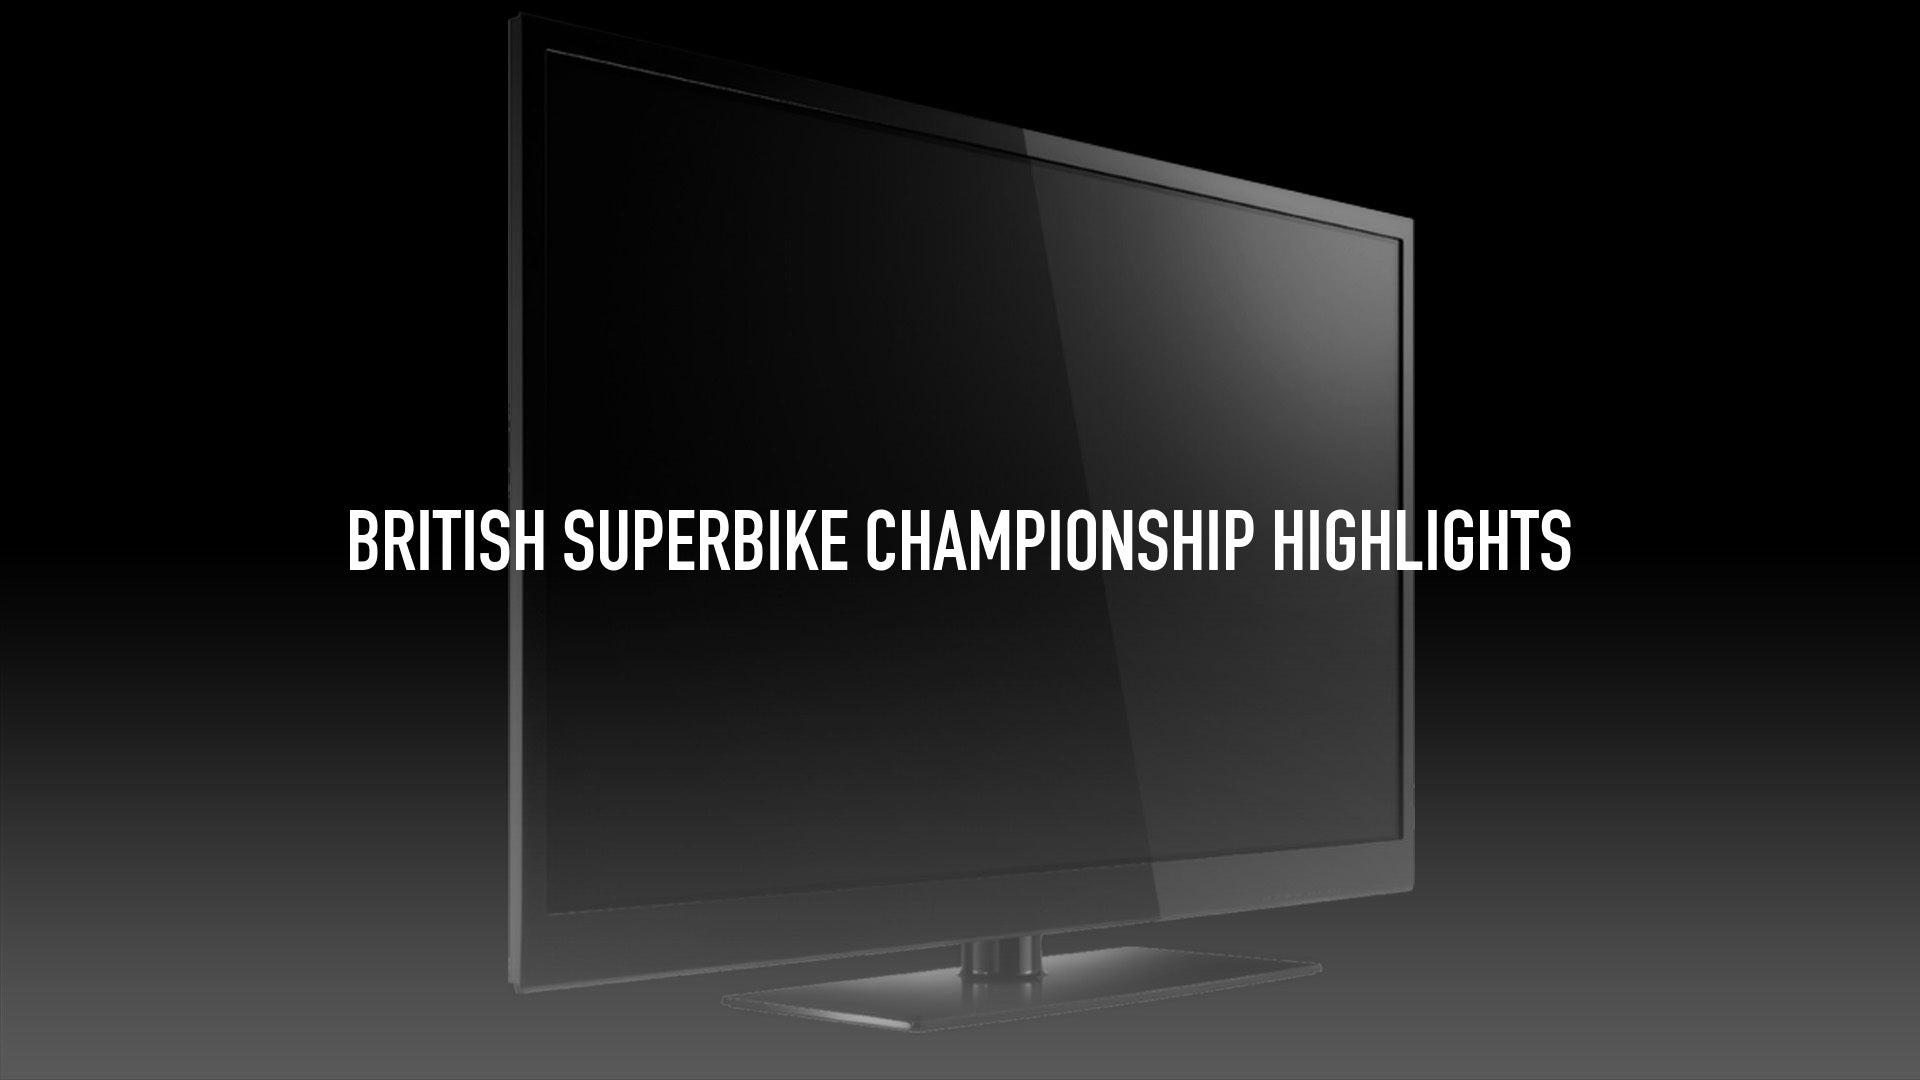 British Superbike Championship Highlights